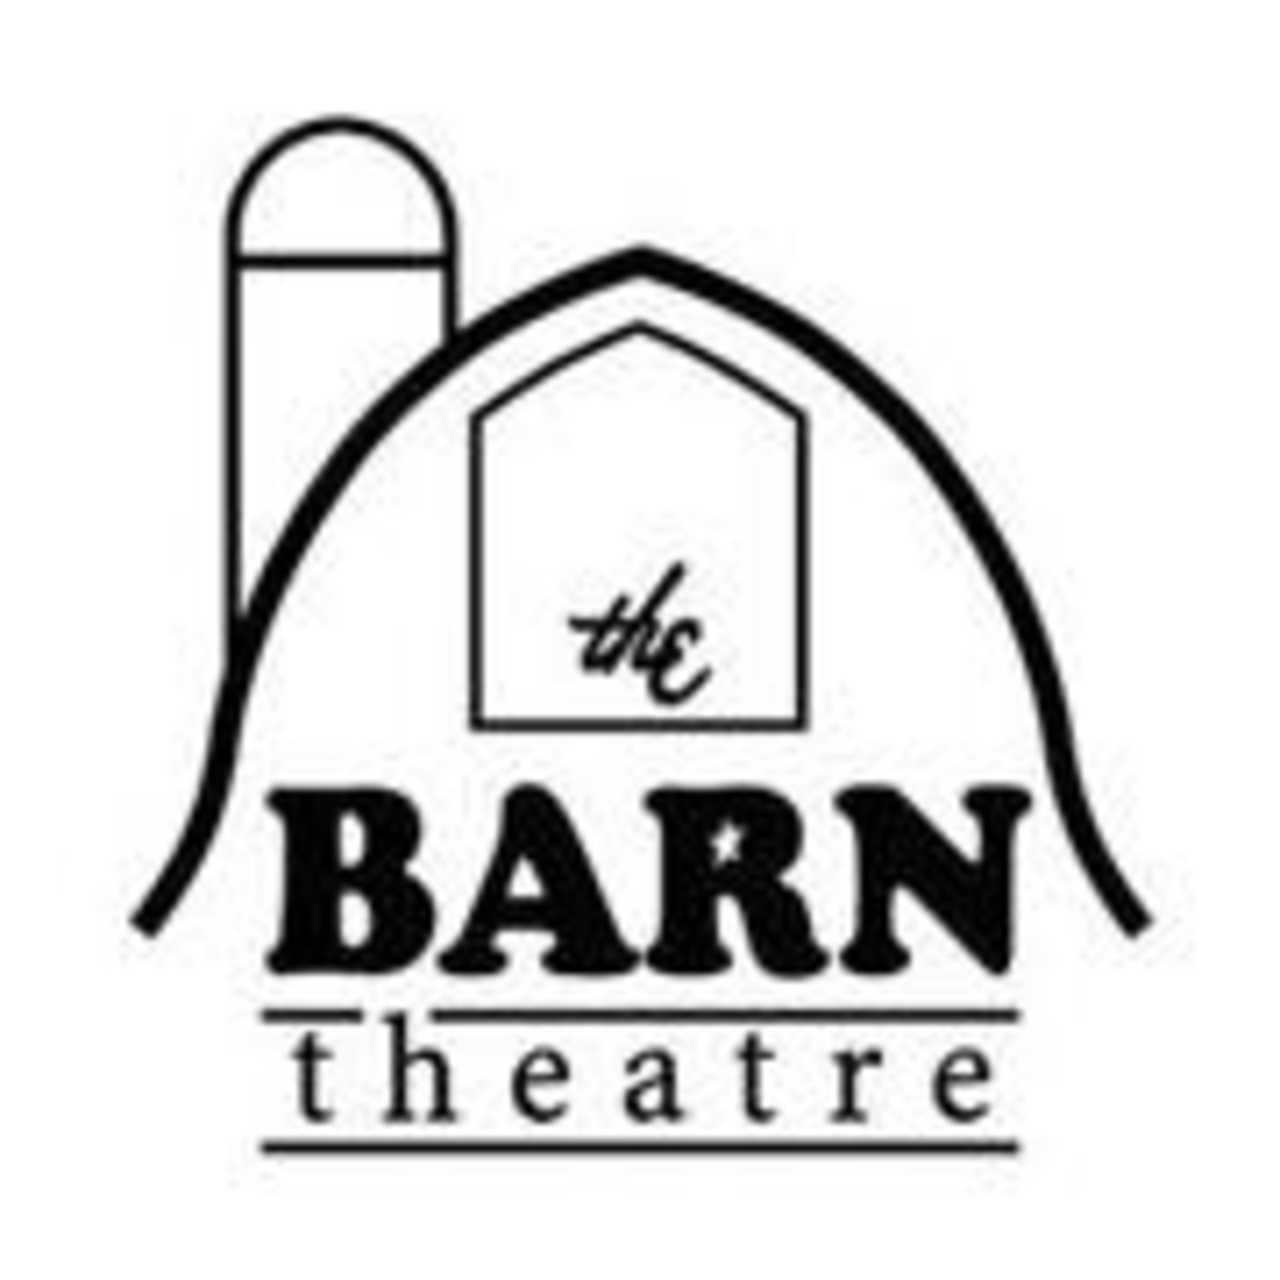 The Barn Theatre - Arts and Entertainment - Theatres in Willmar MN